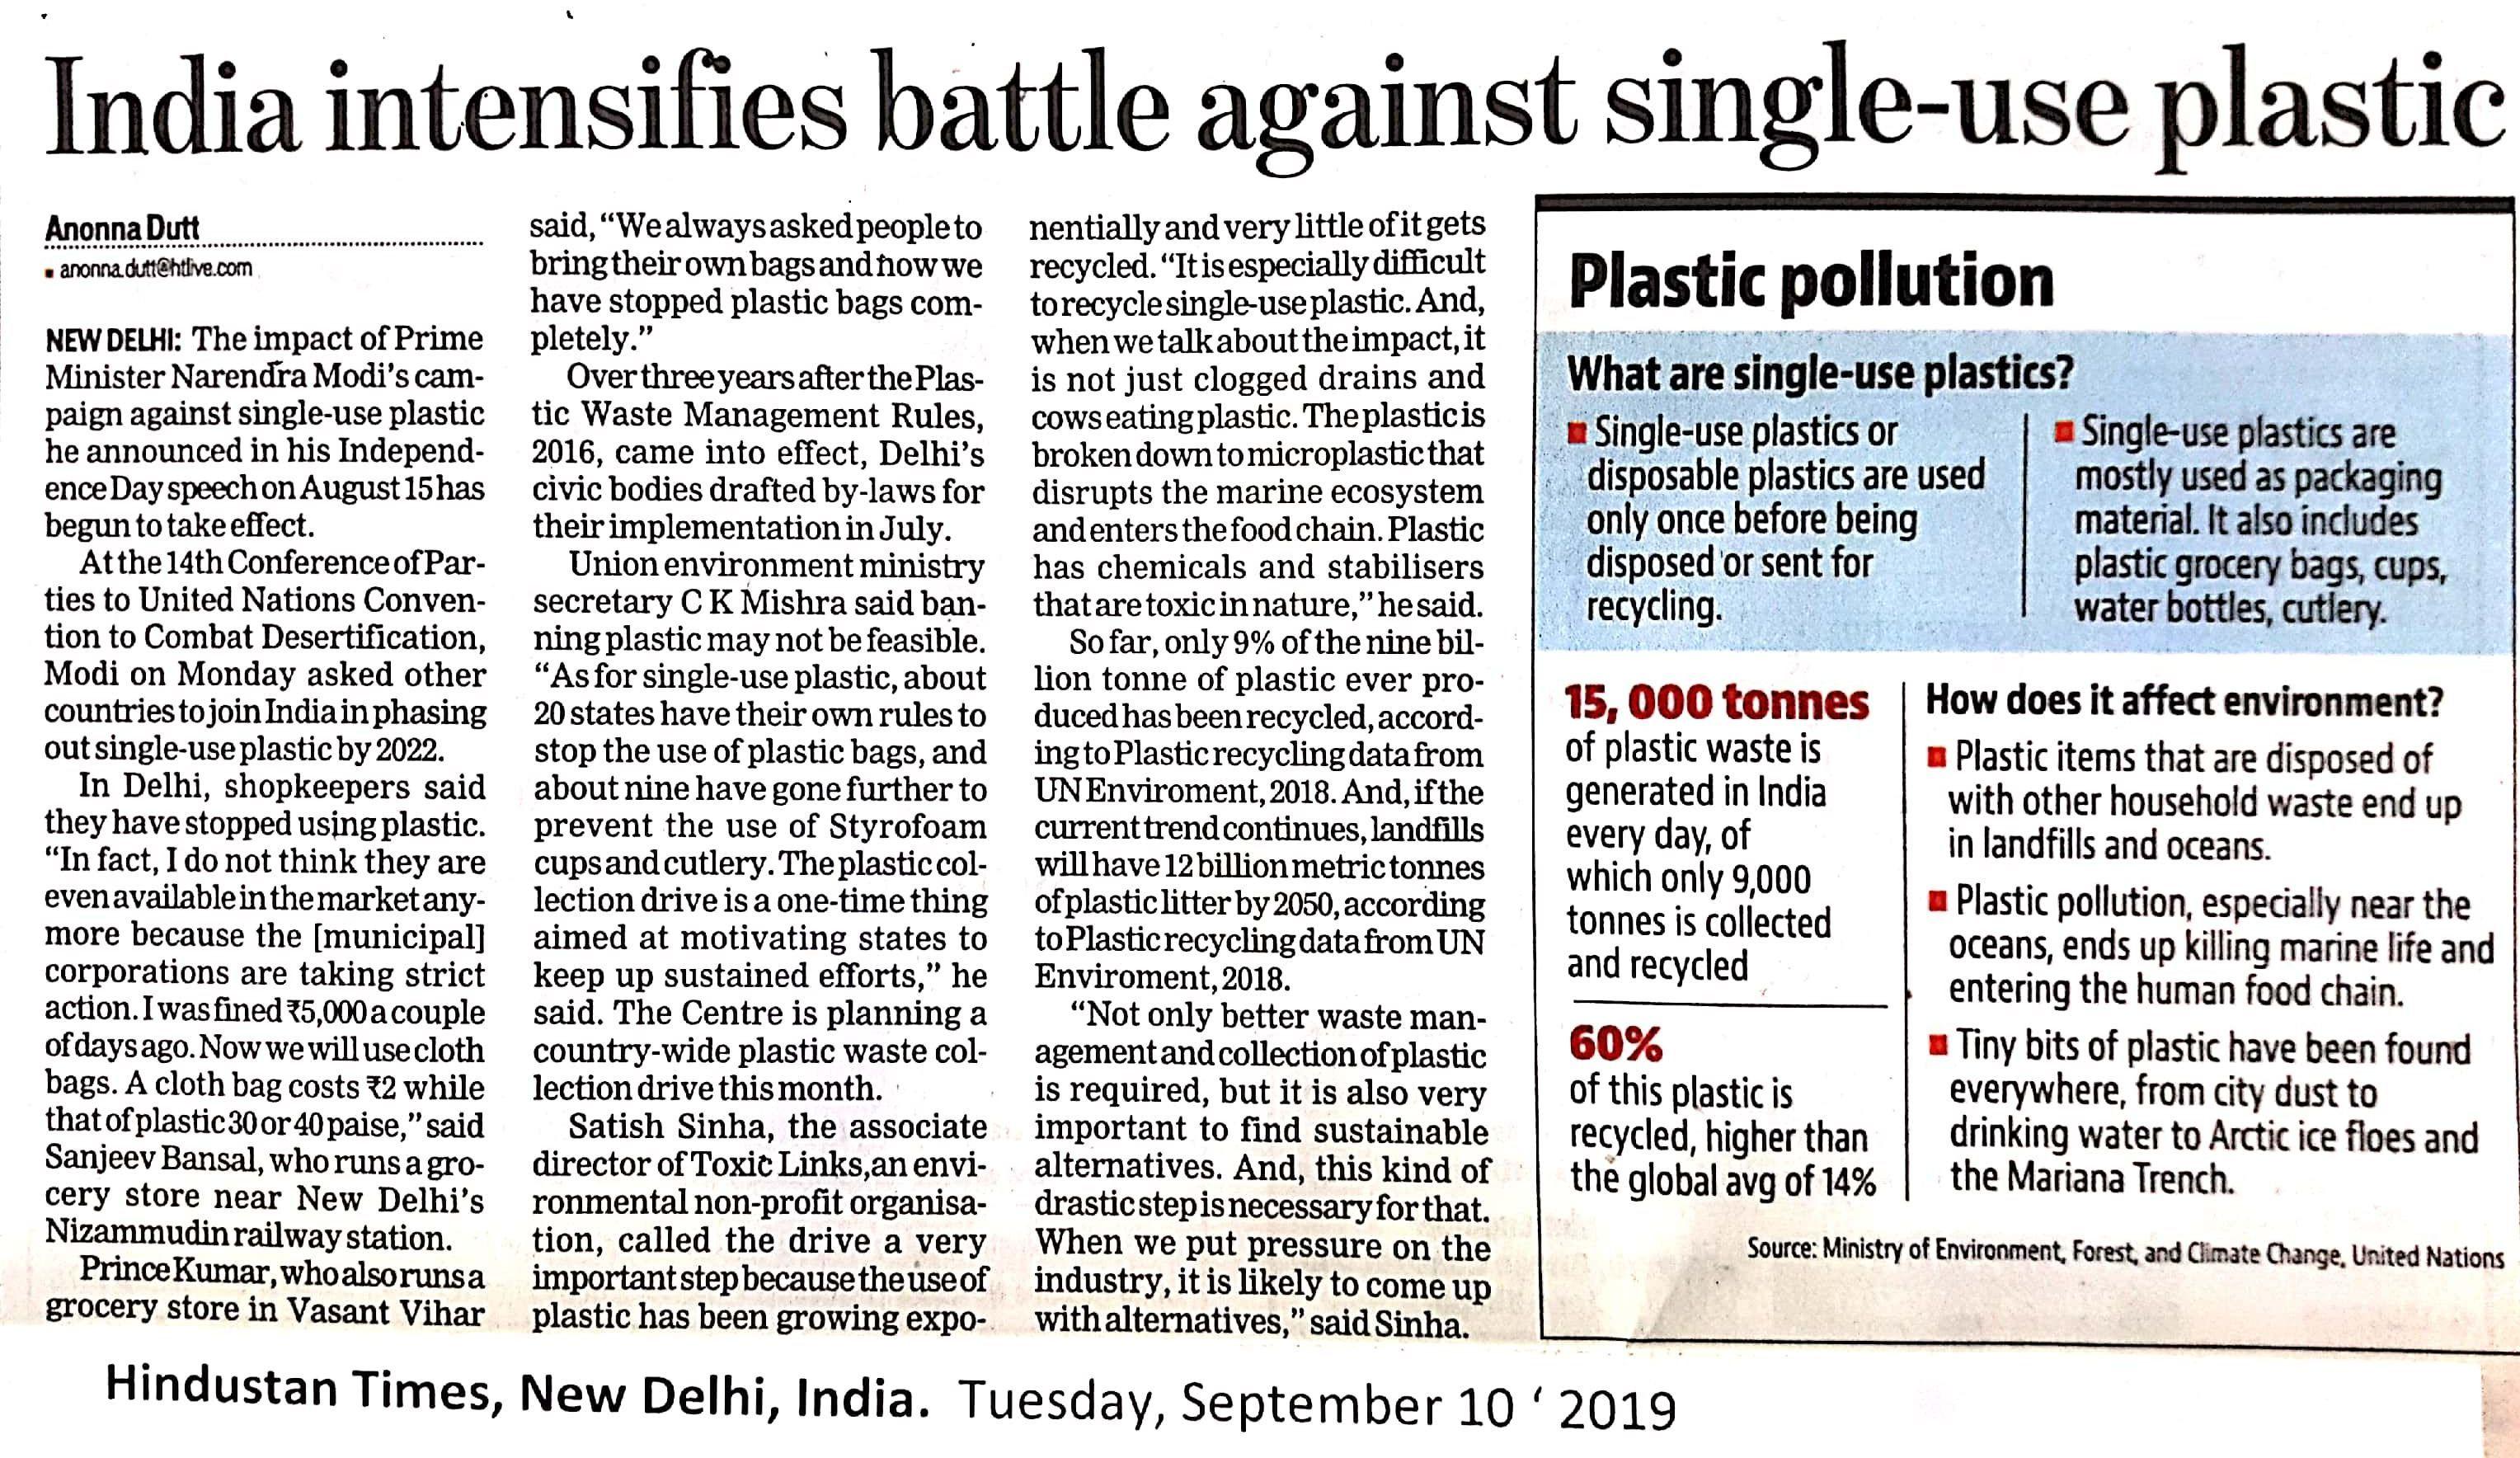 India intensifies battle against single-use plastic.